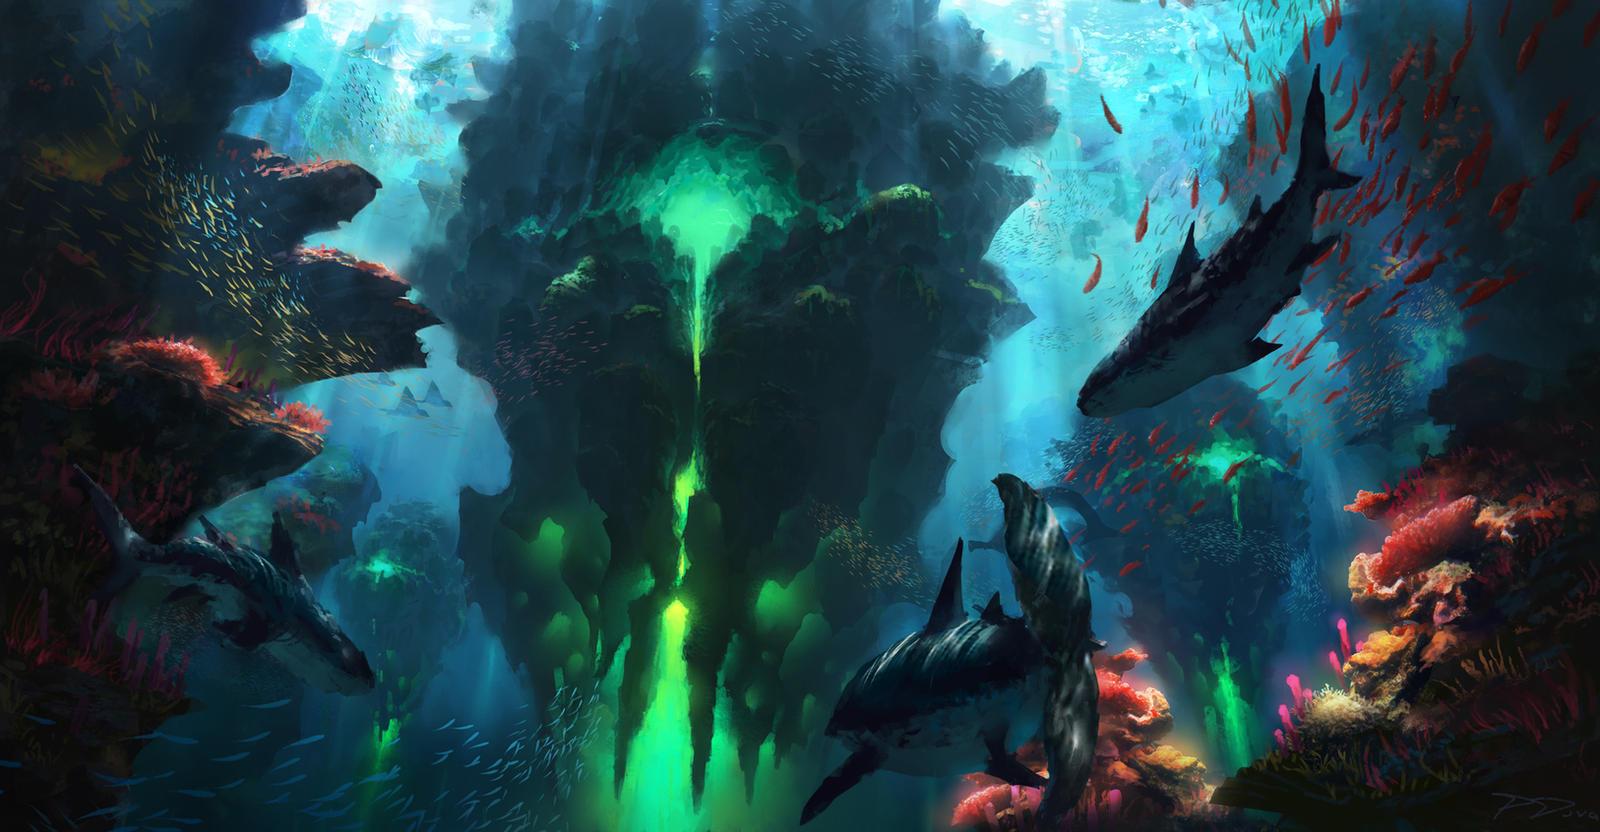 Underwater Fusion by PiotrDura